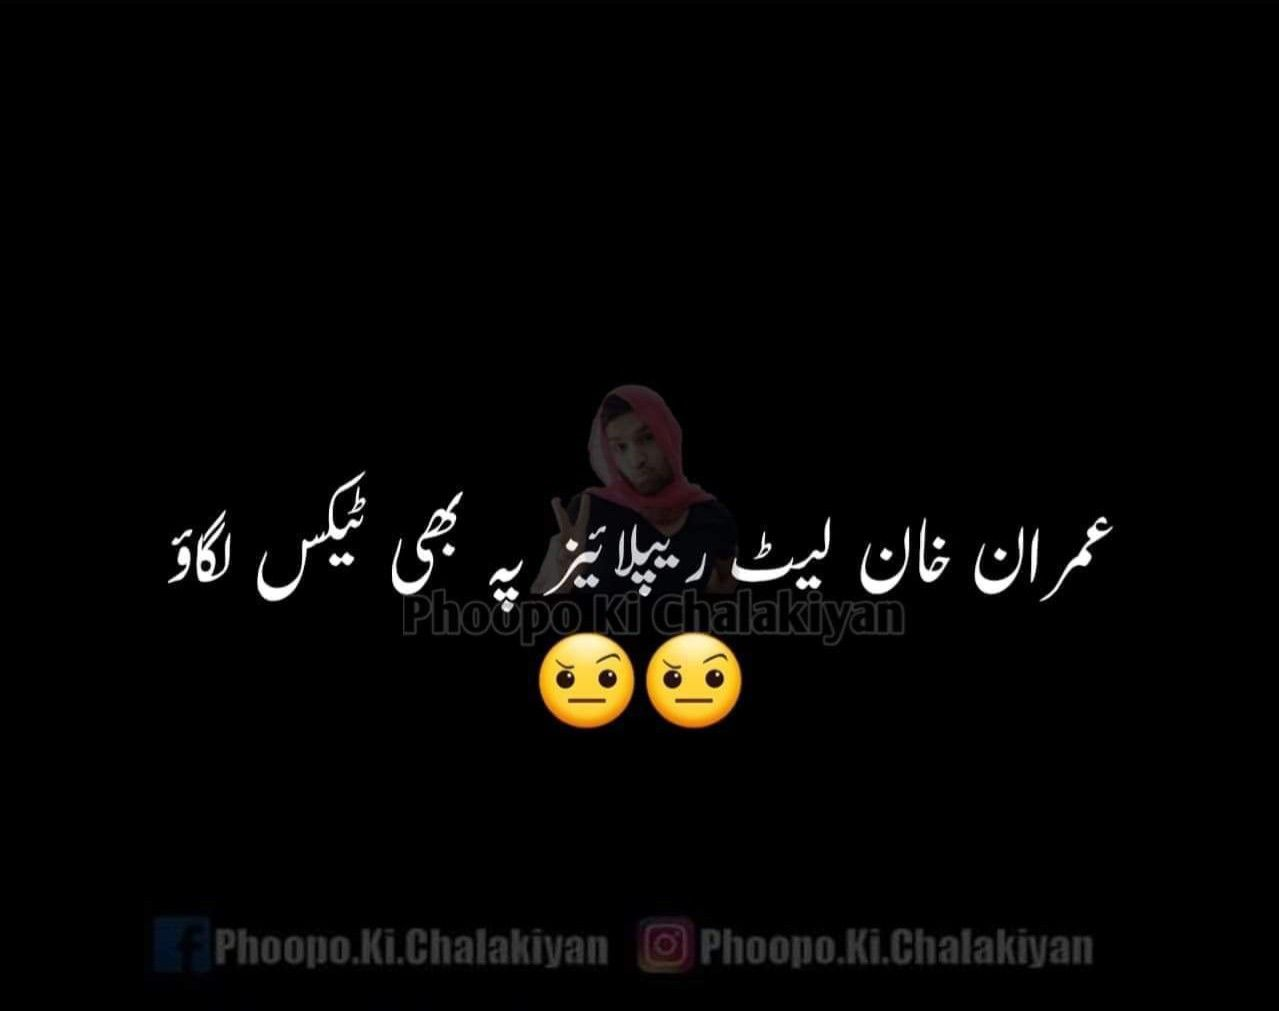 Funny Relationship Quotes In Urdu